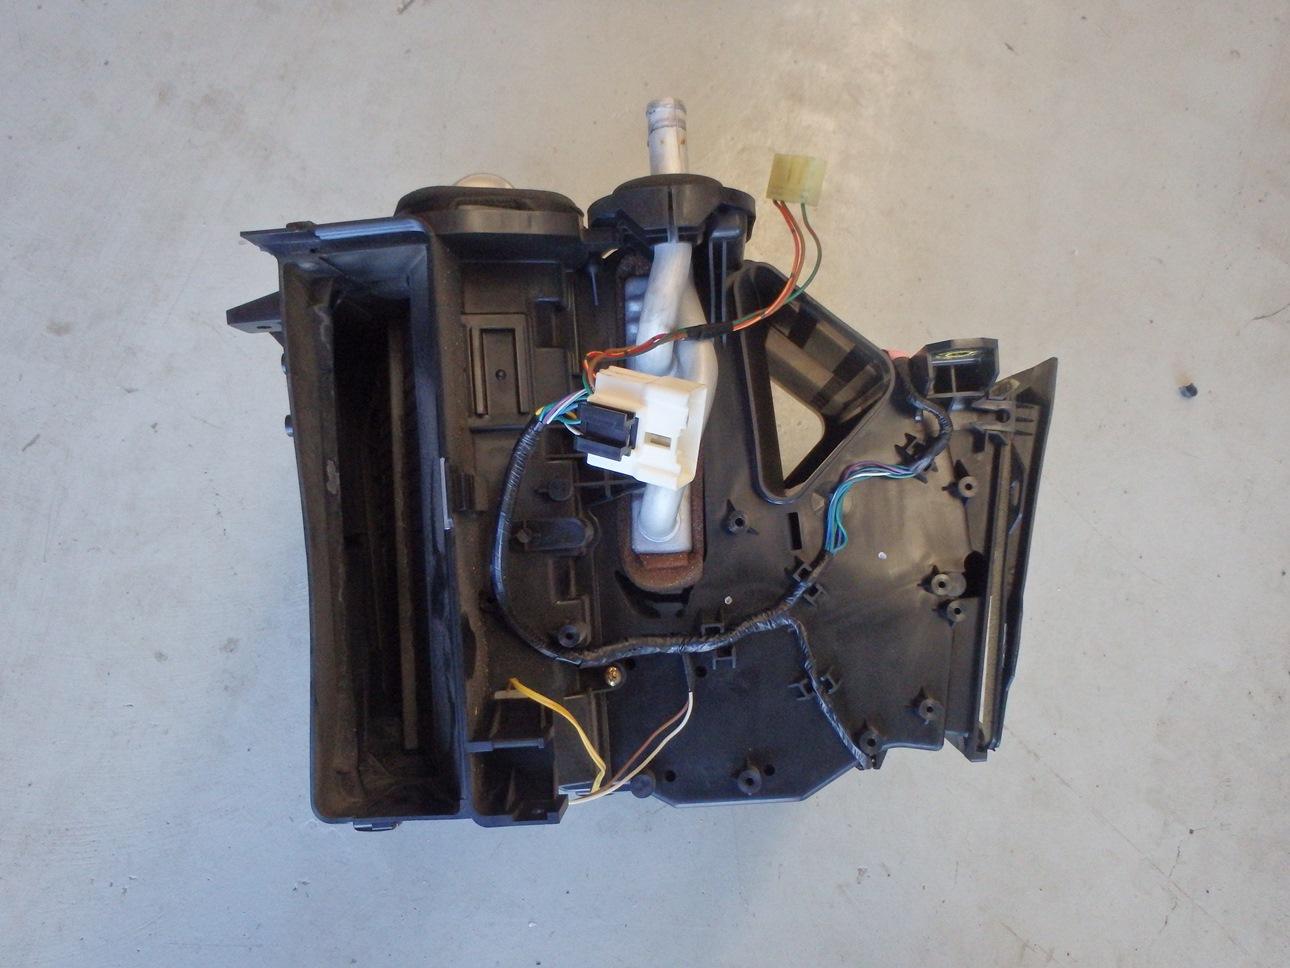 Mitsubishi Lancer Evolution 7 VII CT9A AC Heater Evaporator Core Assembly Box